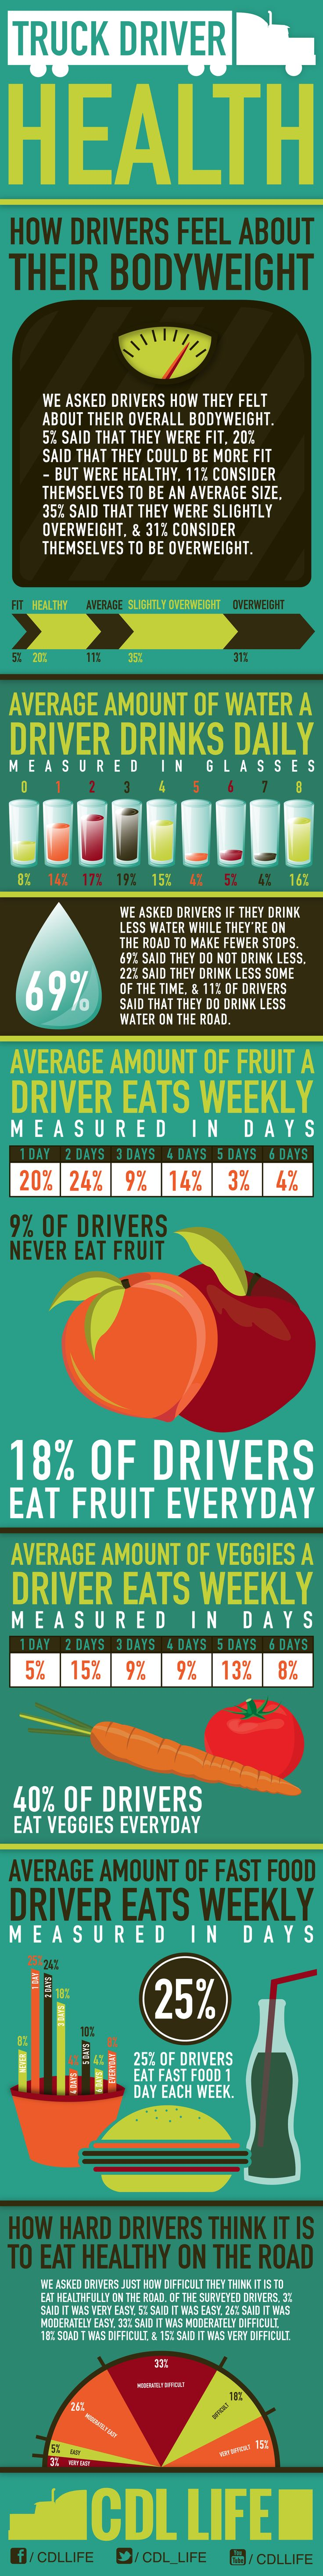 LIKE Progressive Truck Driving School: http://www.facebook.com/cdltruck #trucking #truck #driver   Infographic: Truck Driver Health